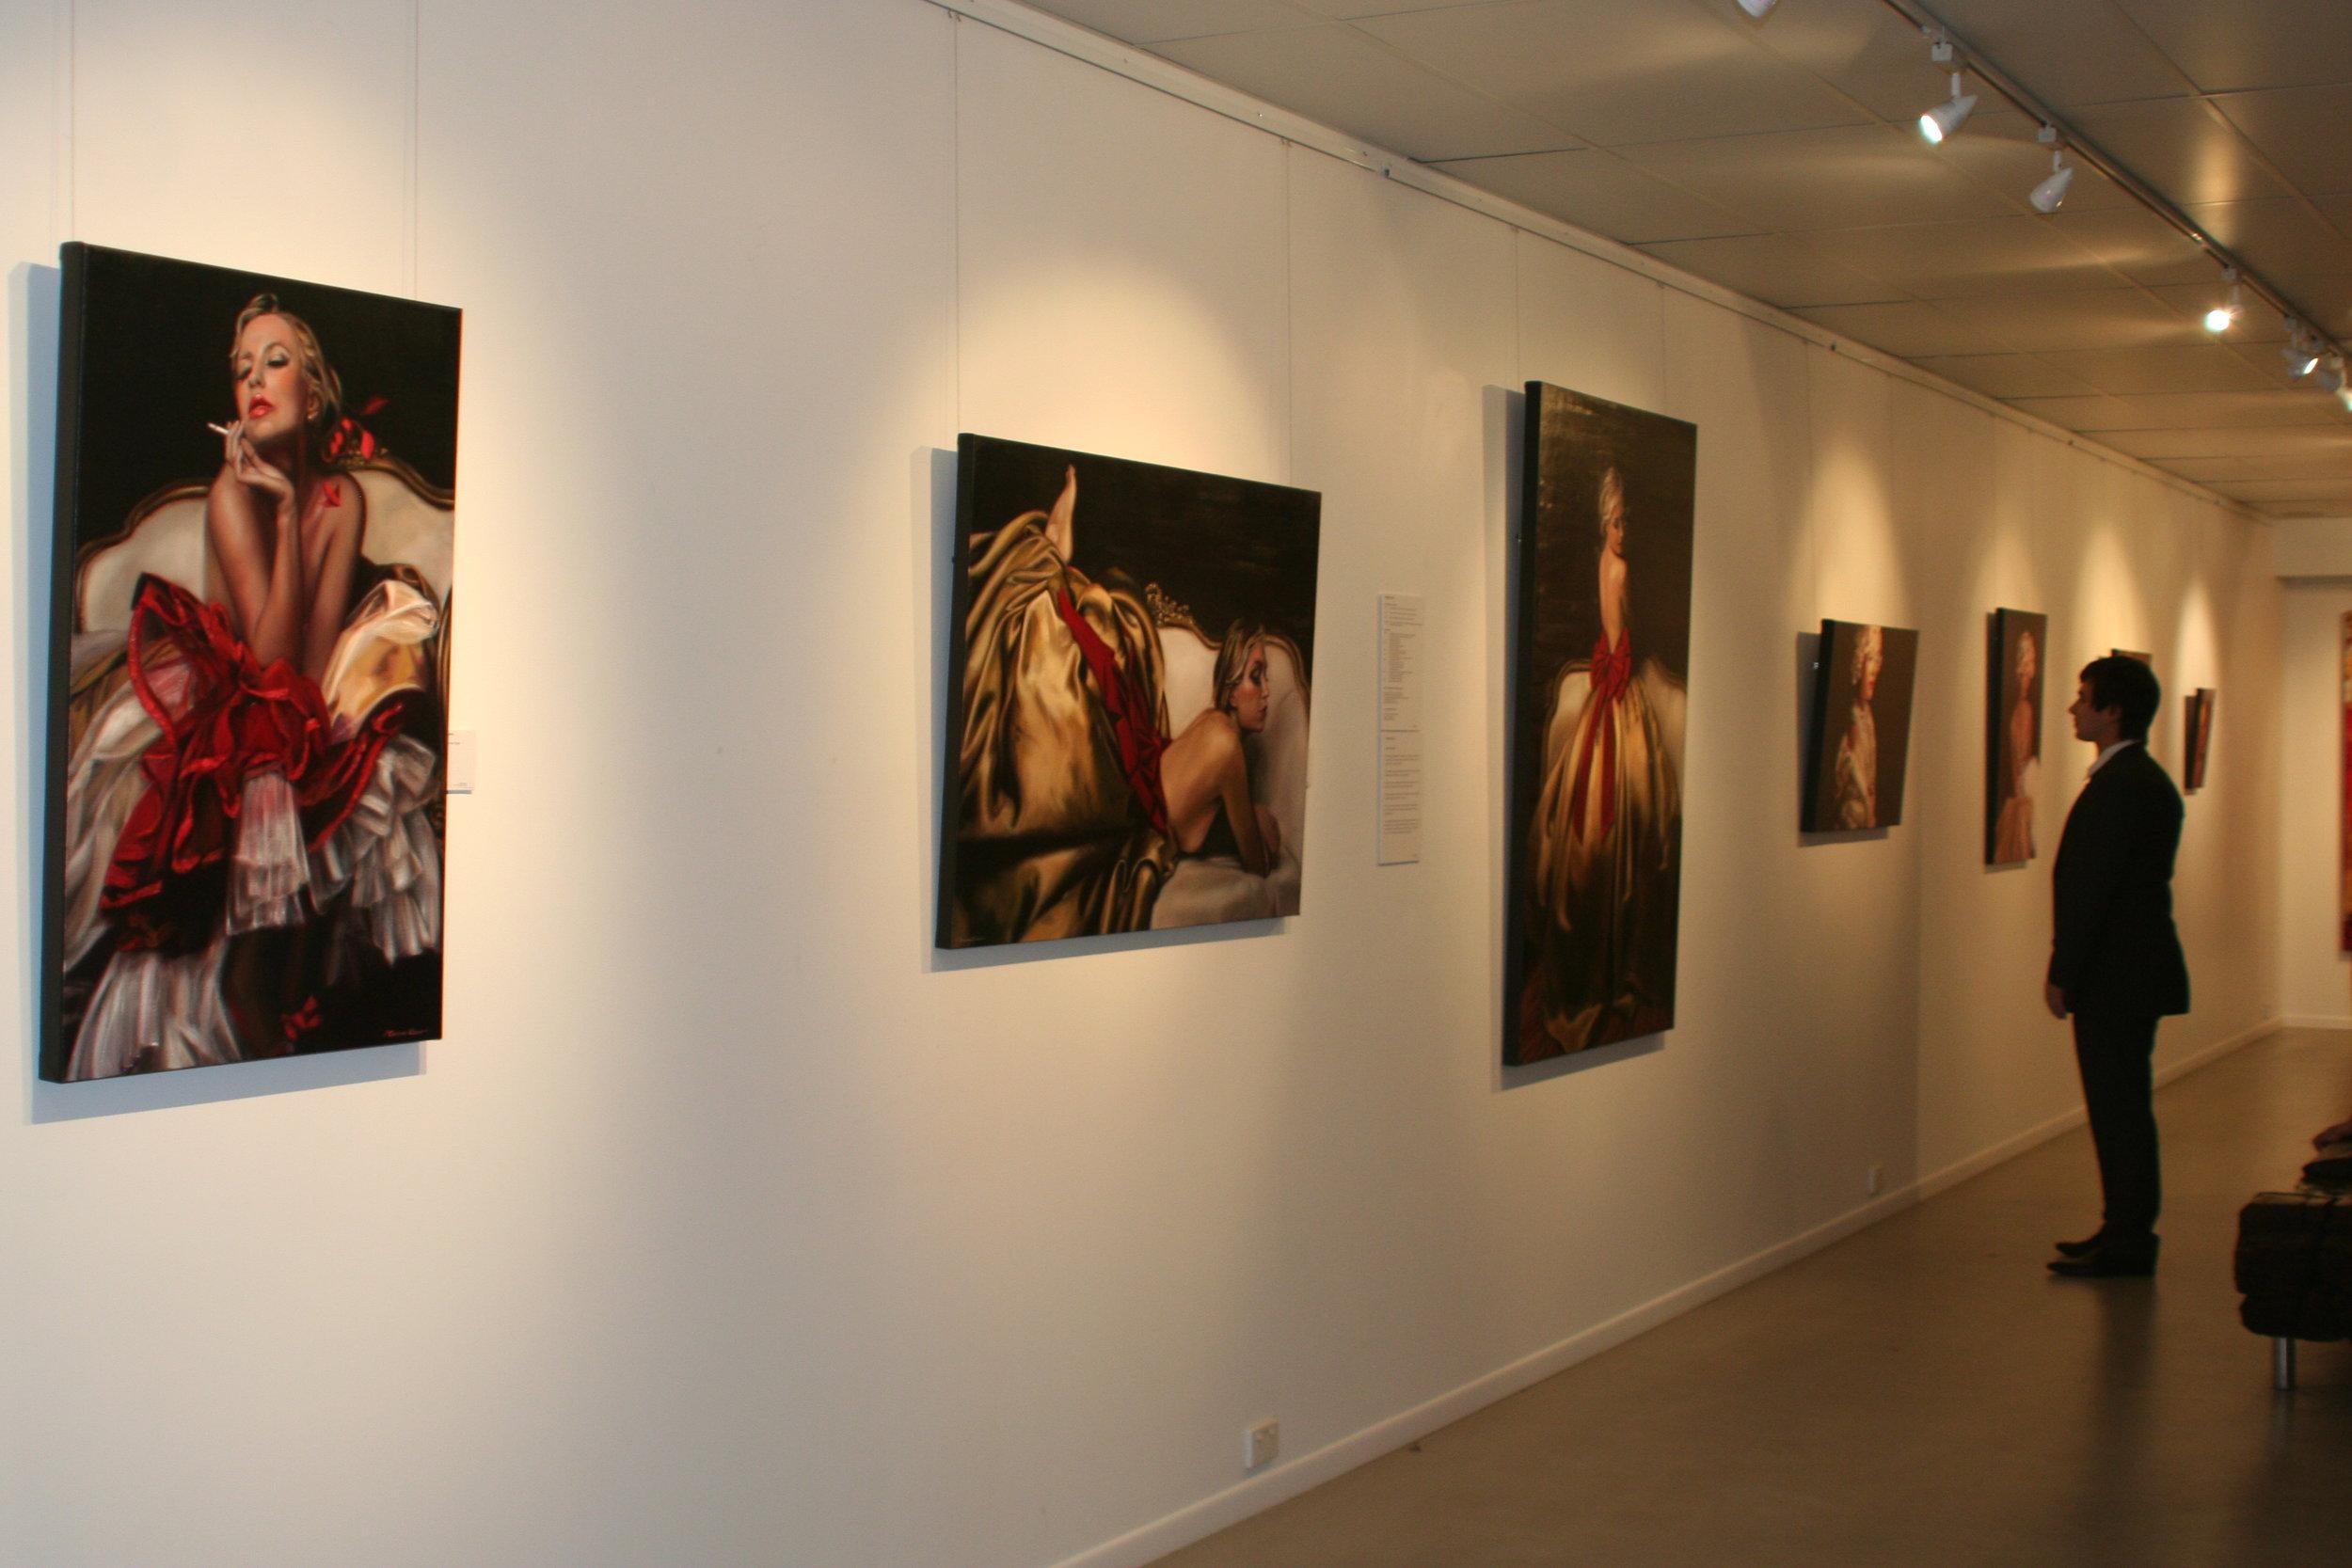 One of Corinne's exhibitions. Brisbane